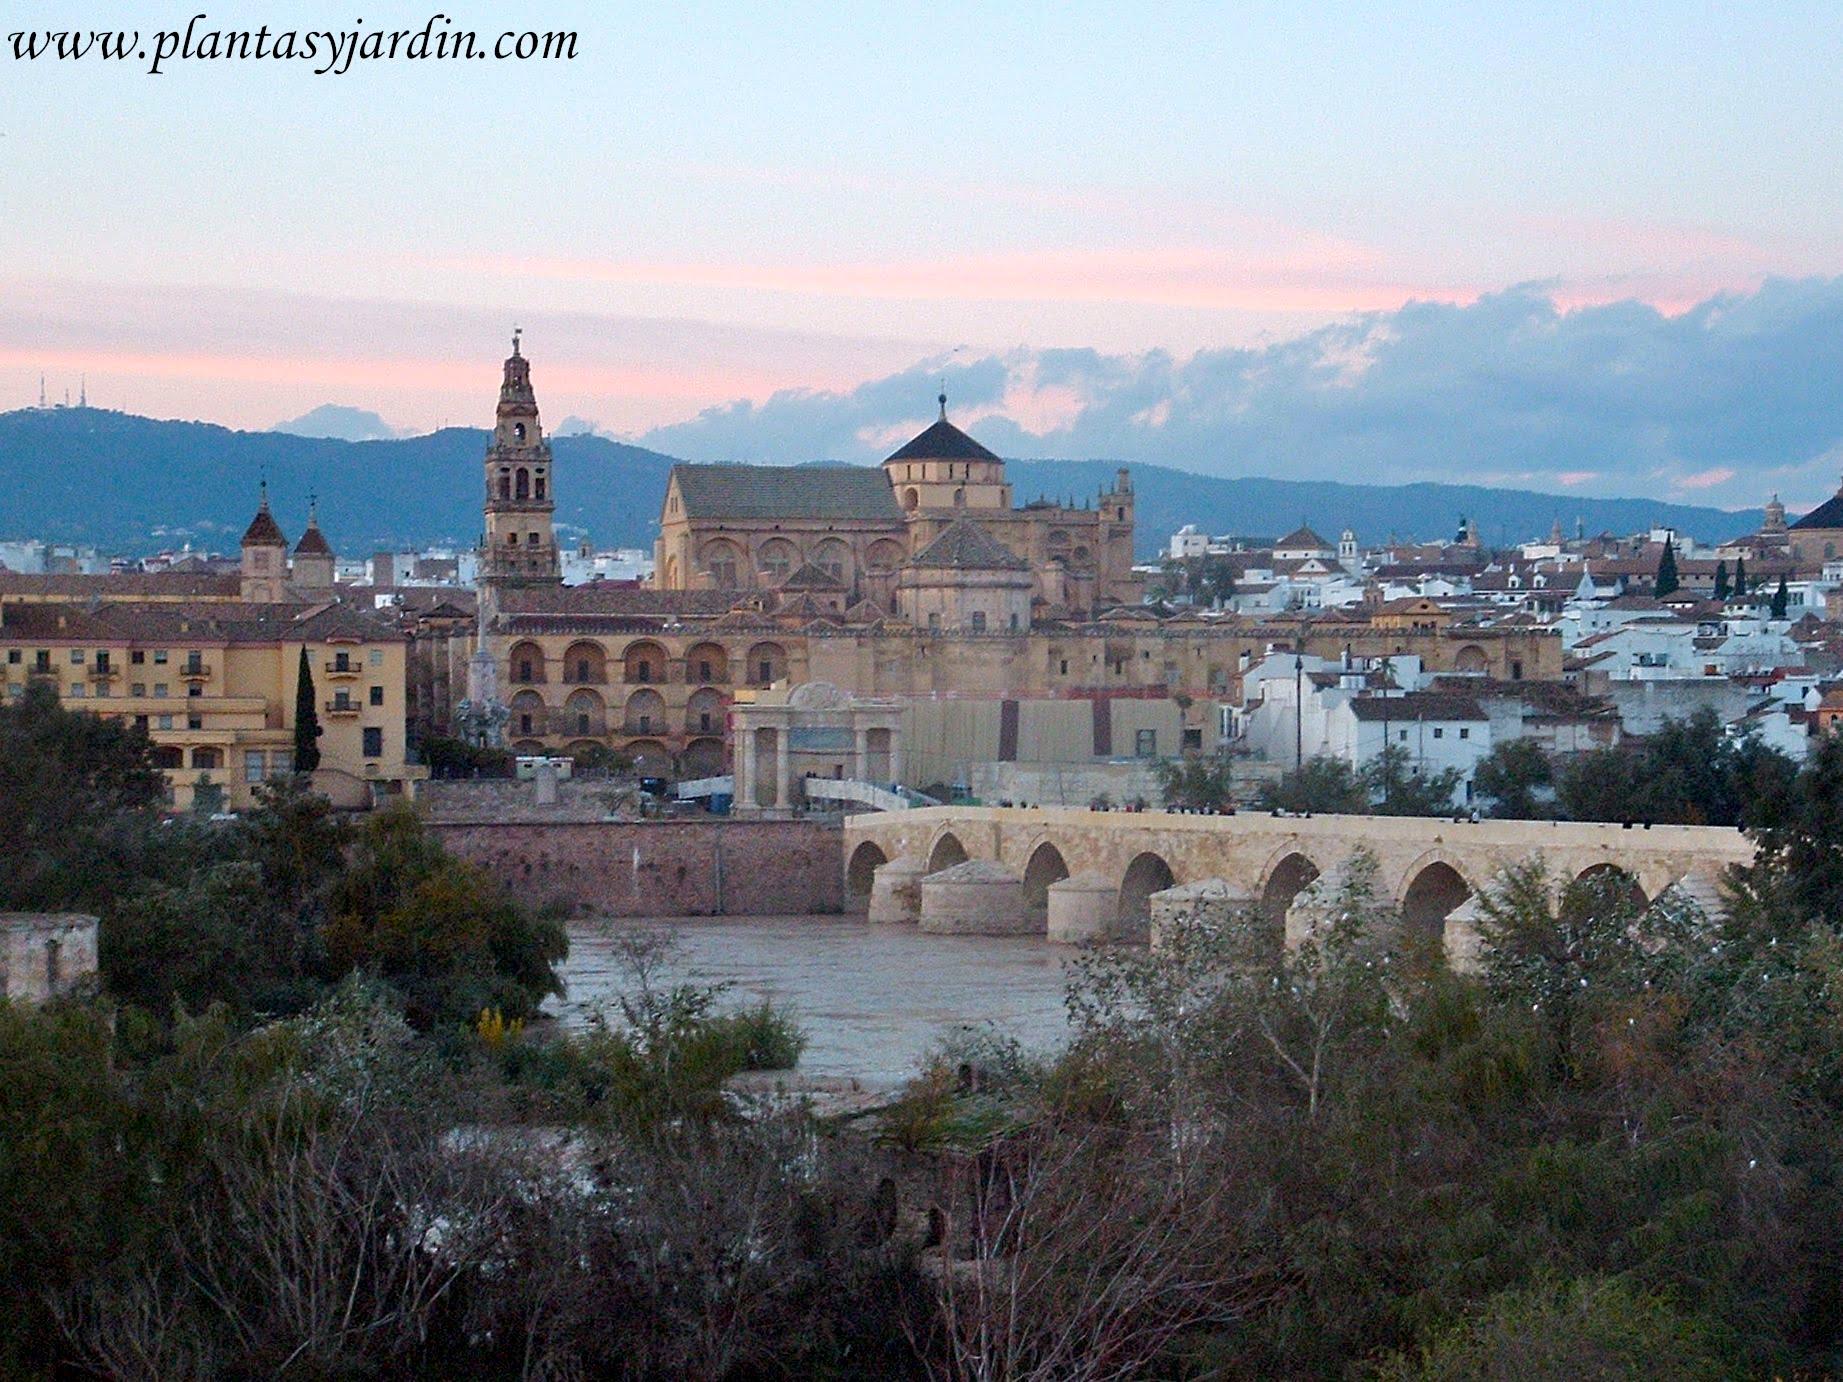 La Mezquita de Cordoba a orillas del rio Guadalquivir